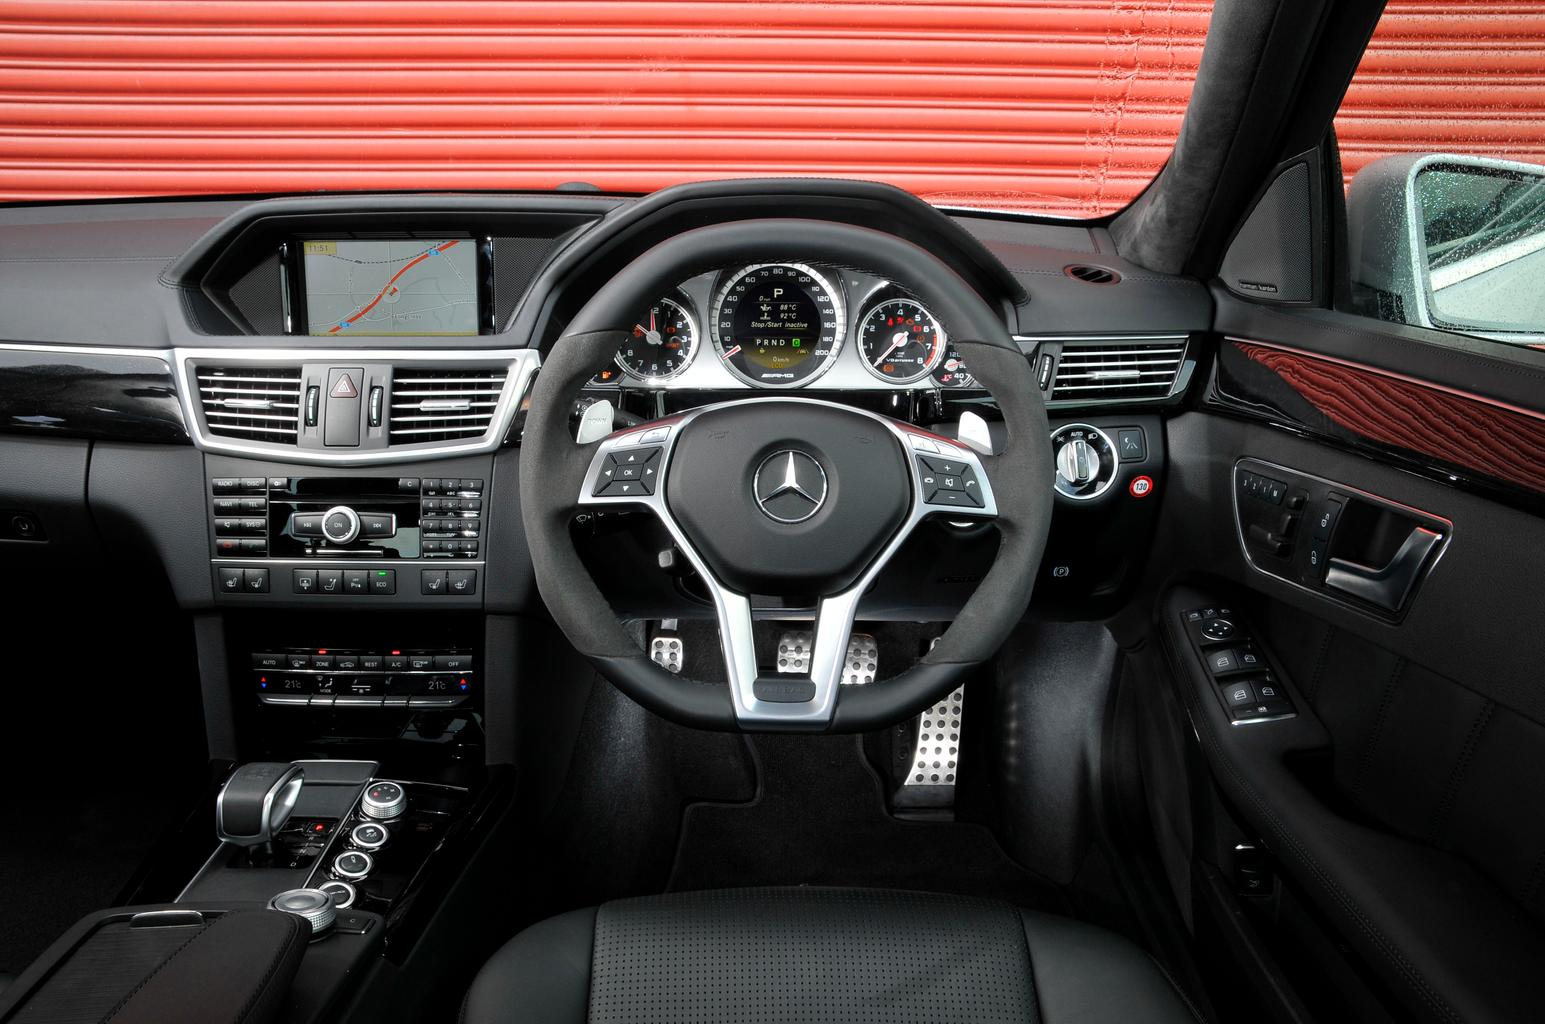 Used test – super saloons: BMW M5 vs Mercedes E63 AMG